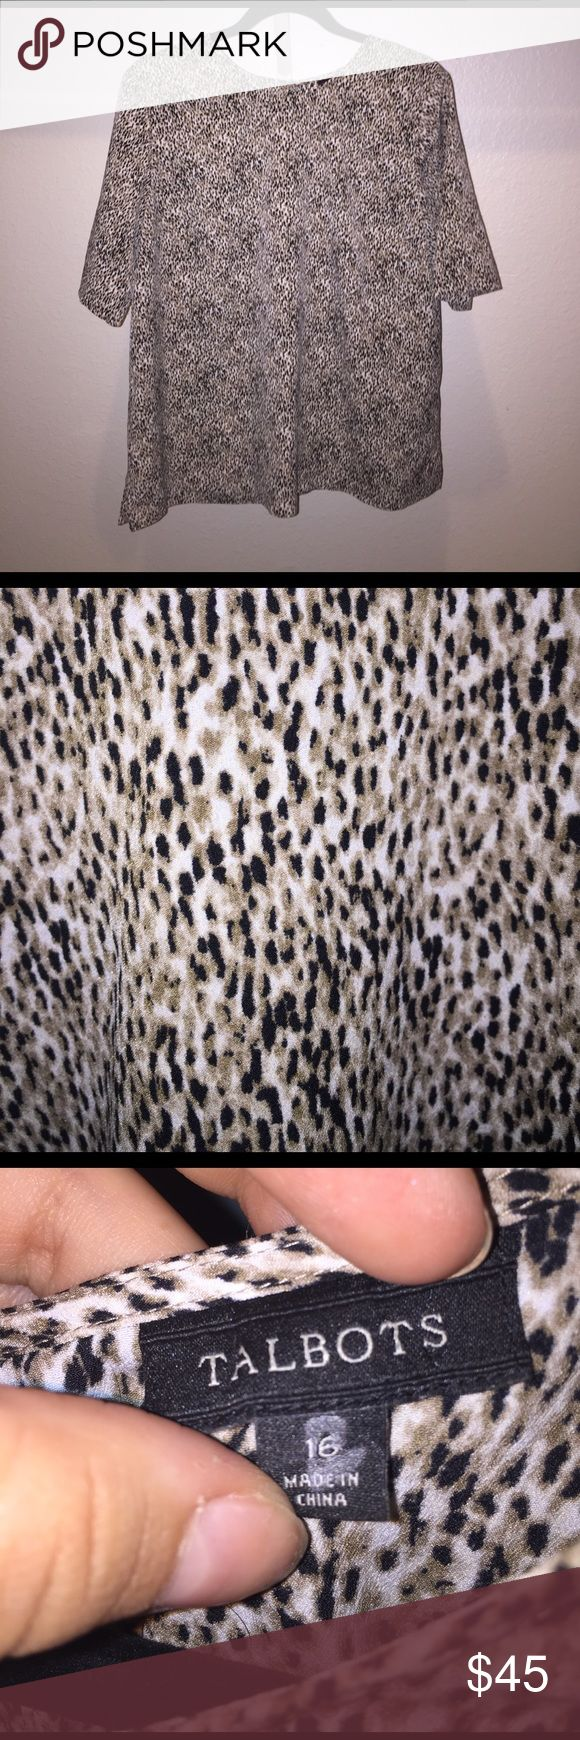 Talbots Animal Print Blouse Animal print blouse. Talbots. Size 16 Talbots Tops Blouses